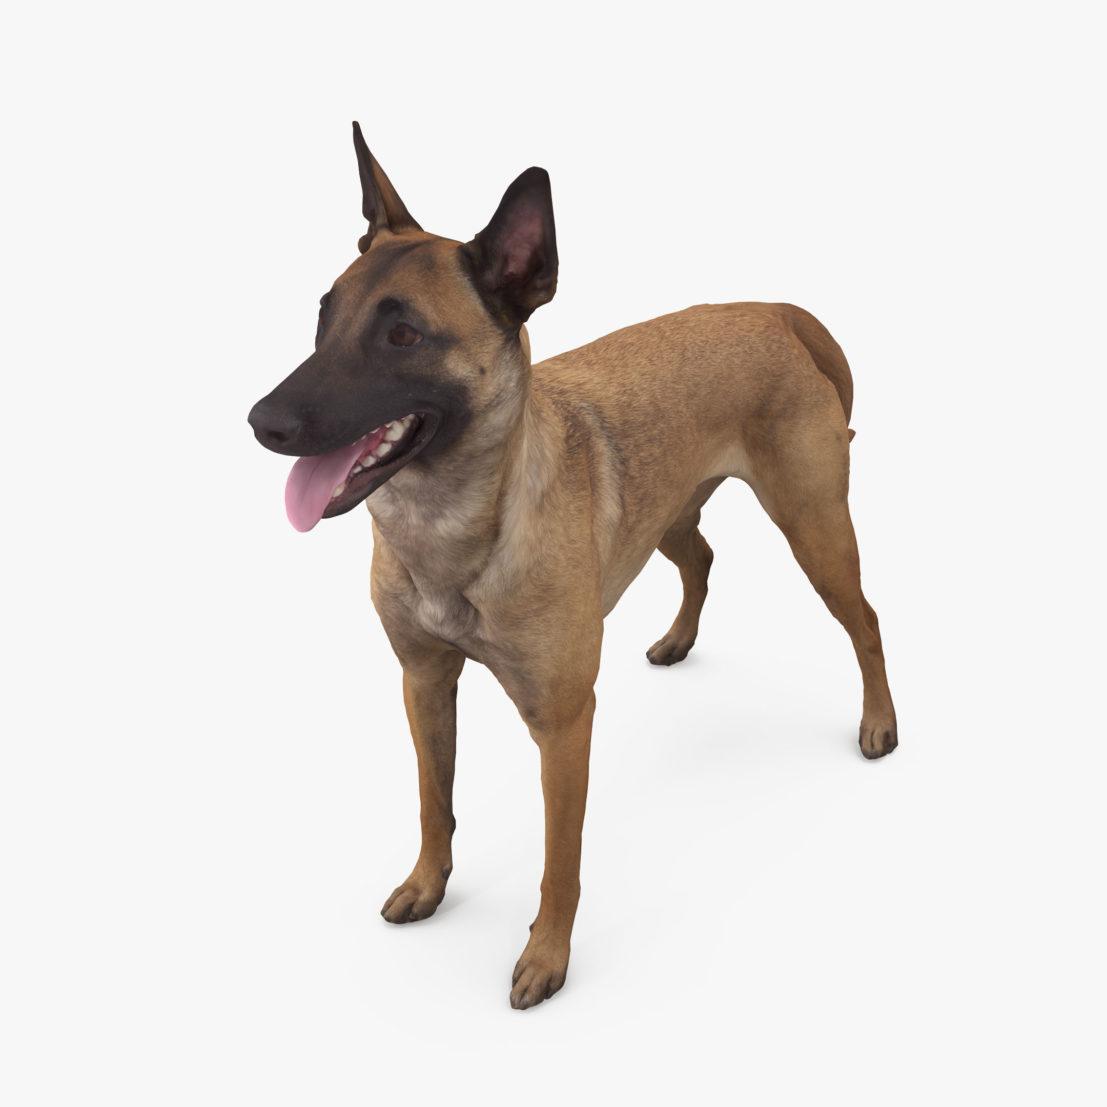 Malinois Dog Standing 3D Model | 3DTree Scanning Studio